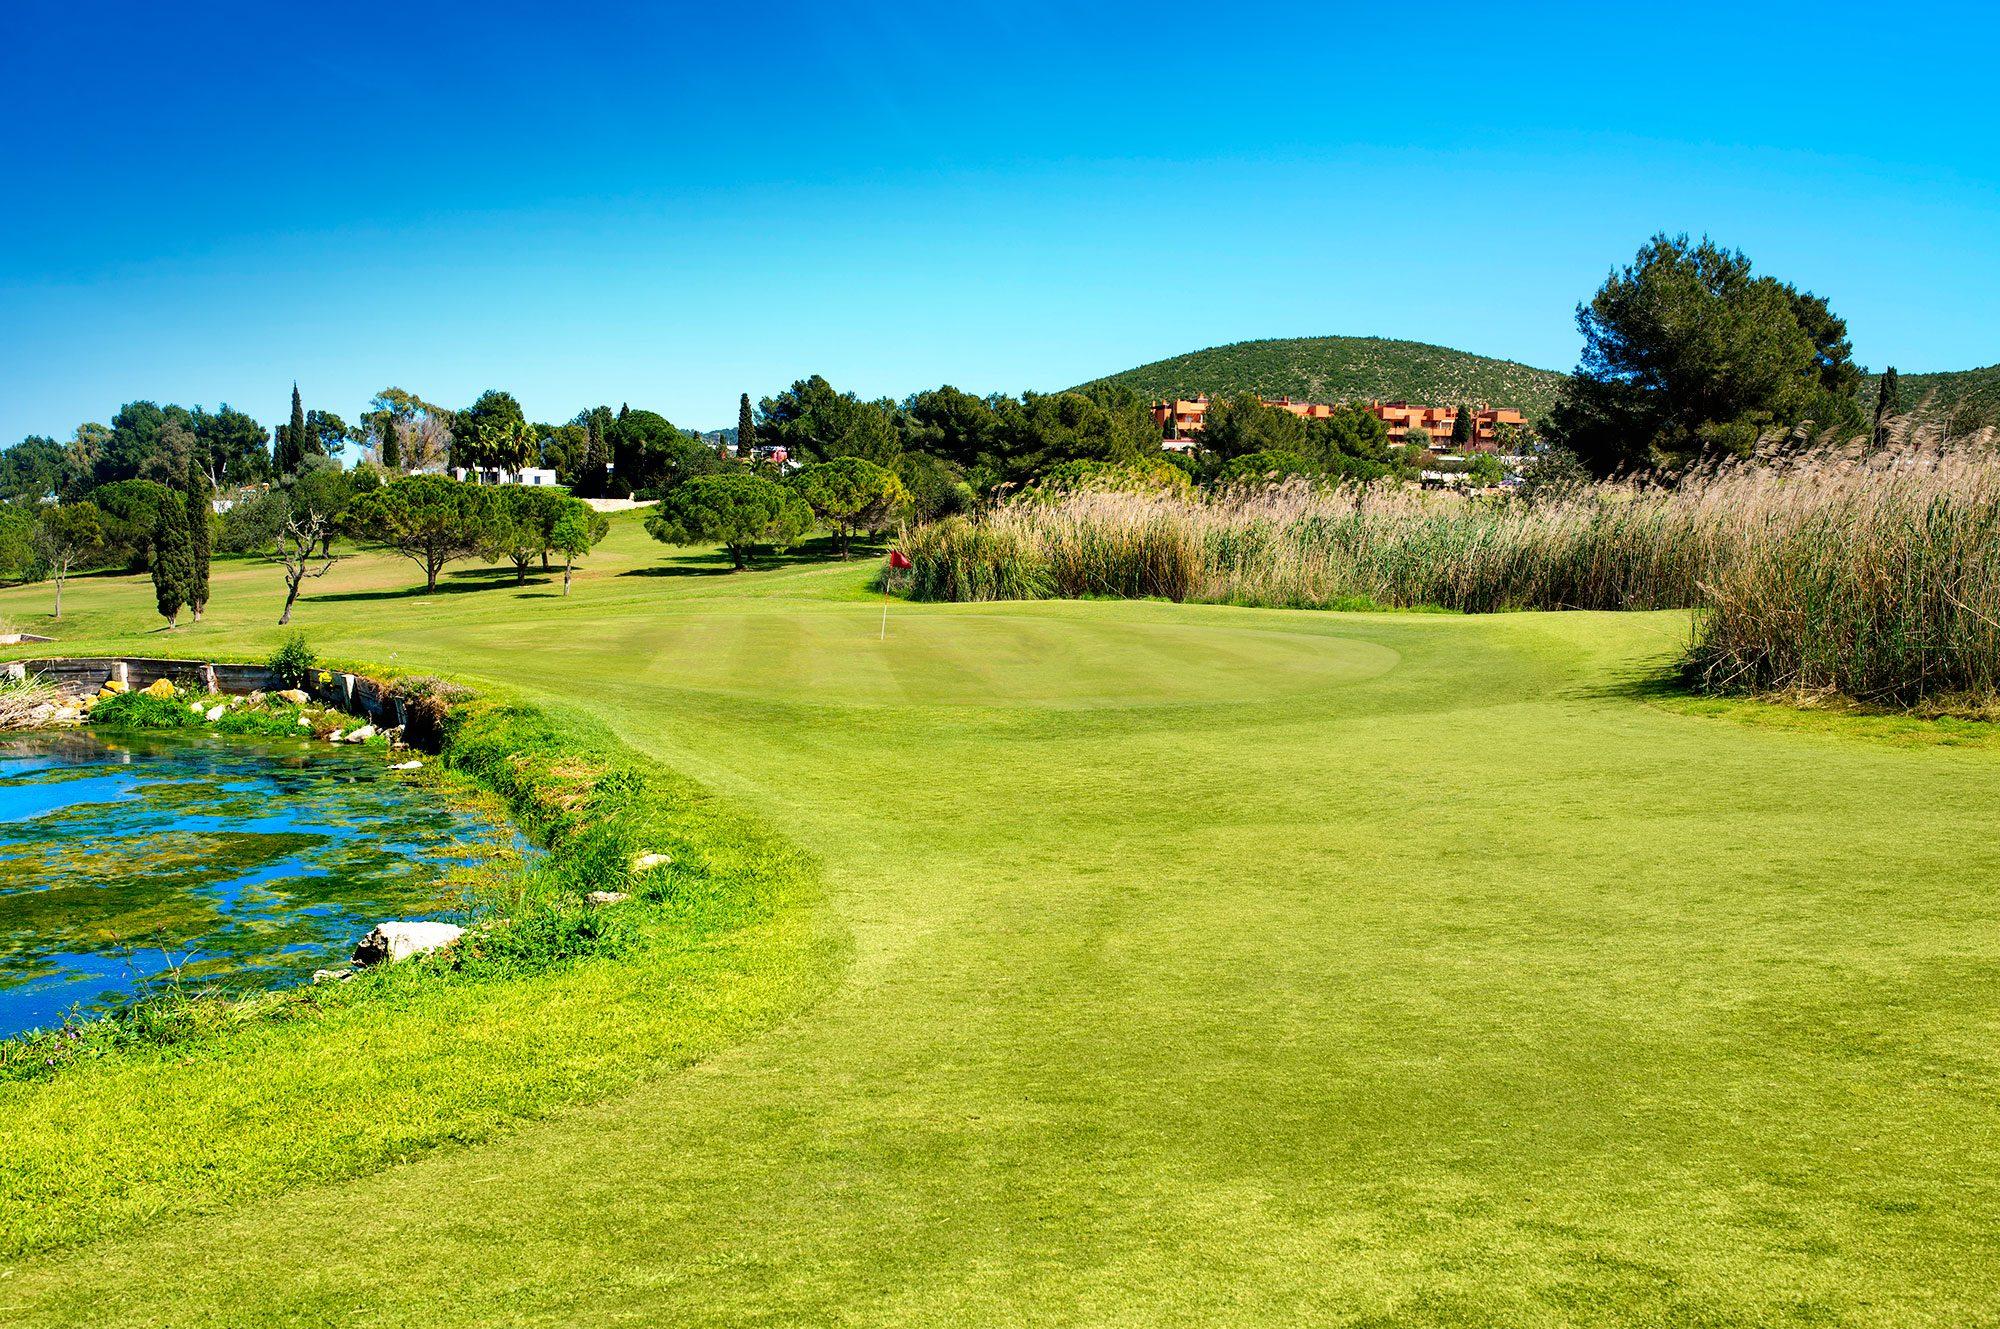 Golf ibiza roca llisa 9 loch platz golf ibiza - Roca llisa ibiza ...